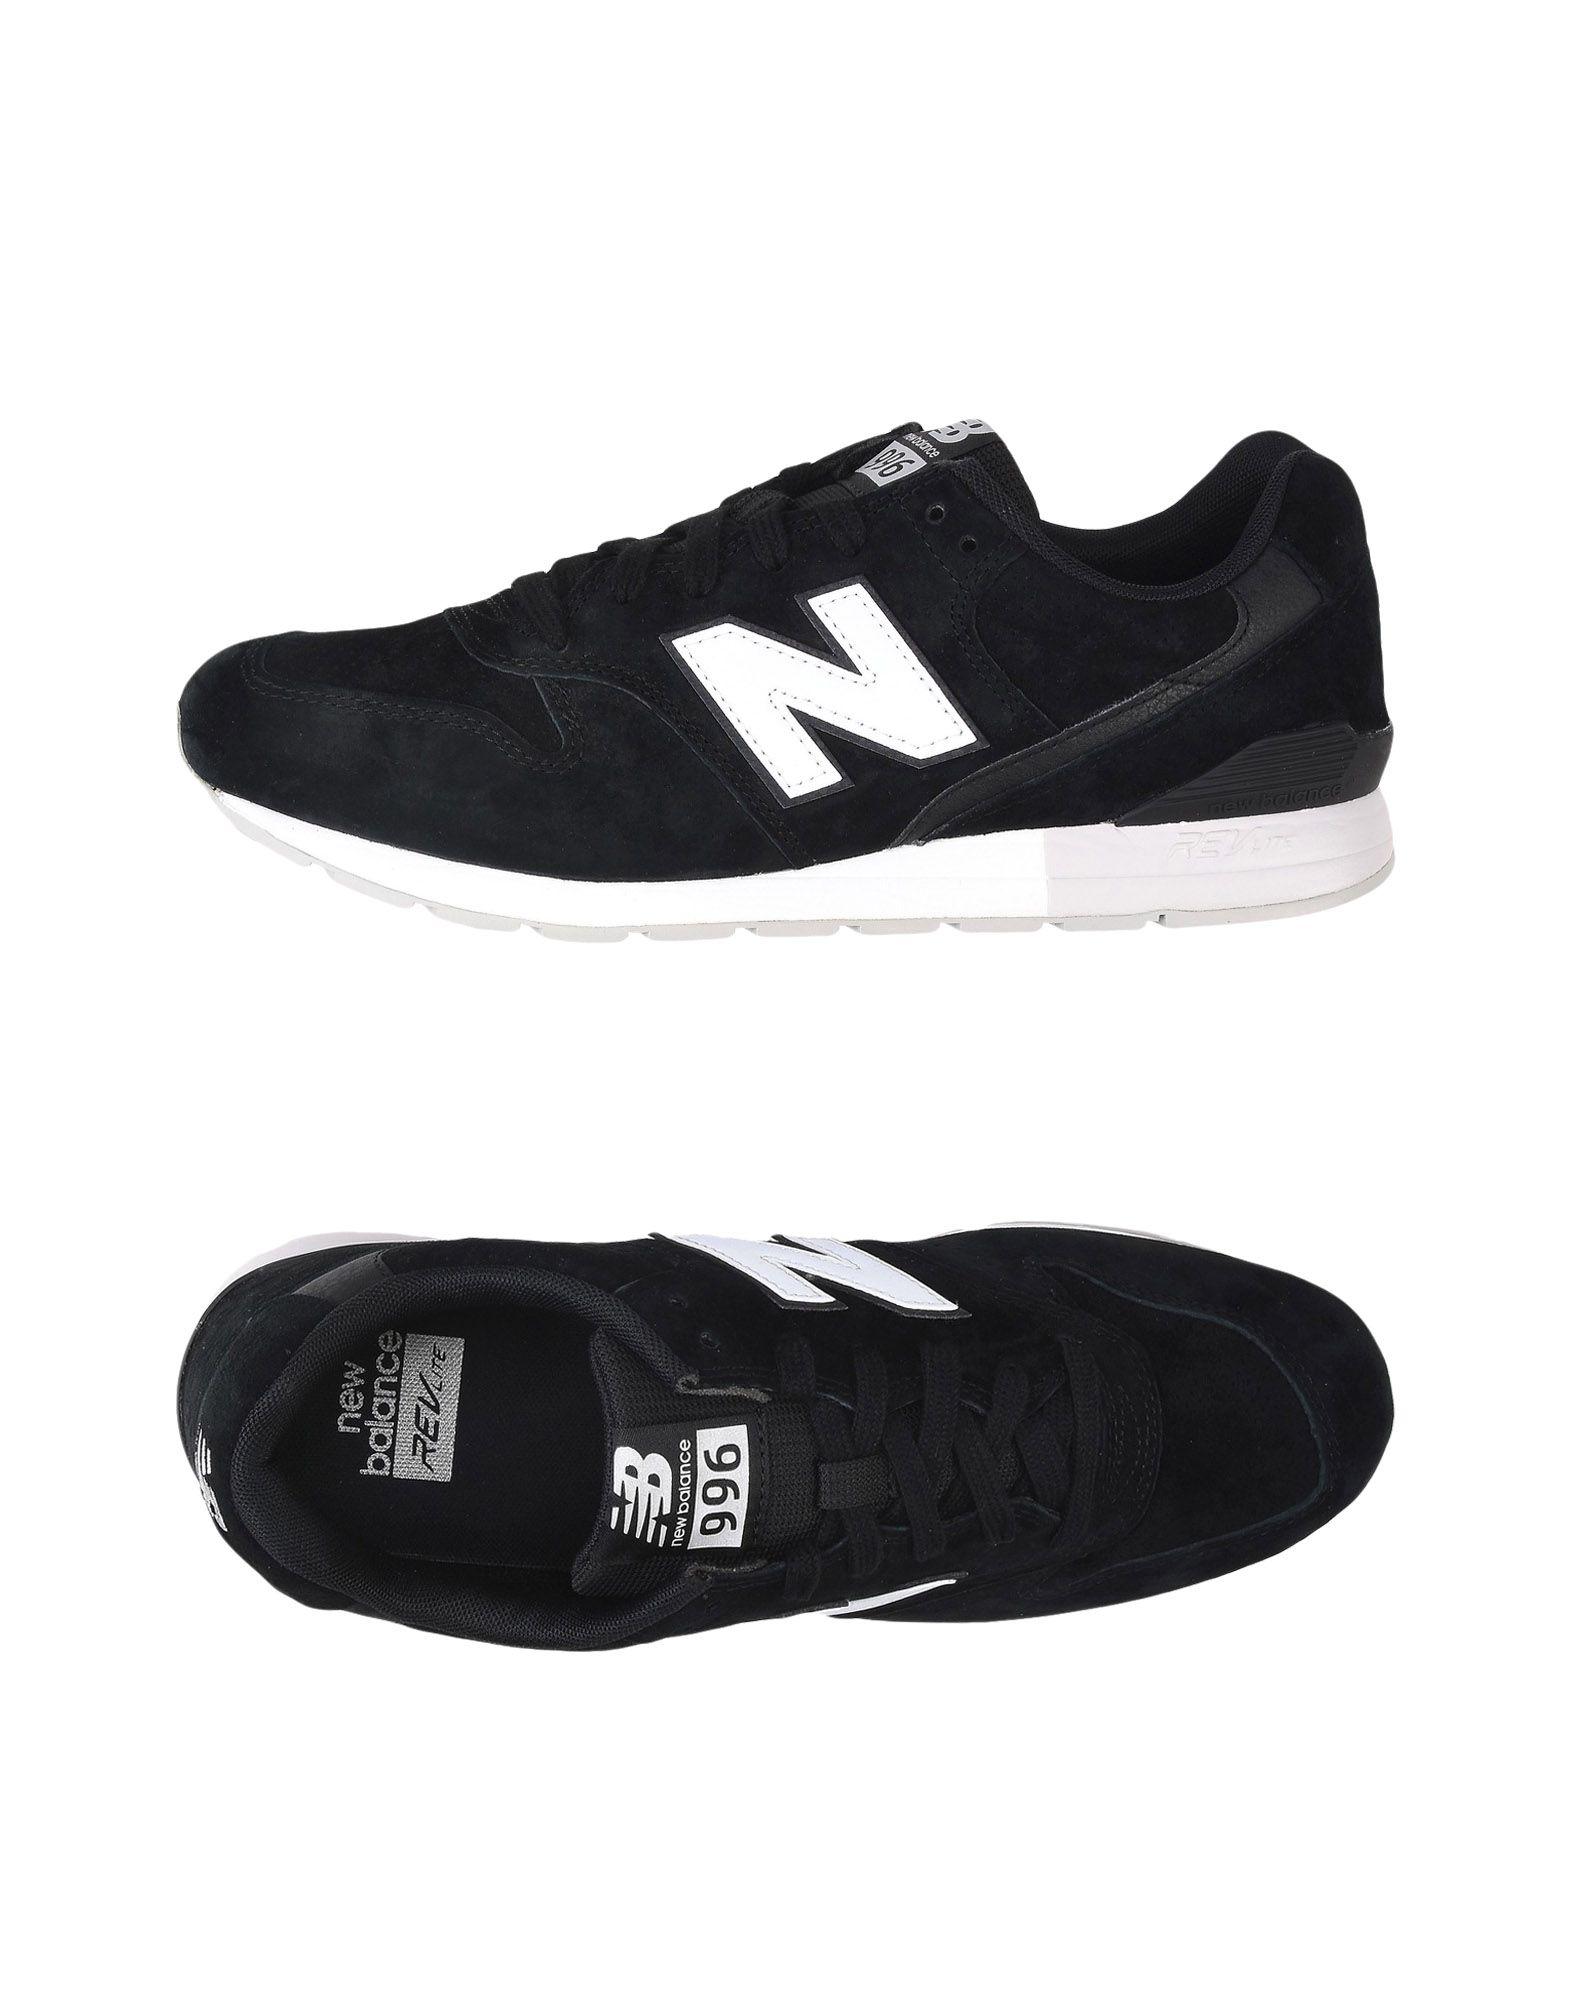 Sneakers New Balance 996 Premium Suede - Uomo - 11393115FV